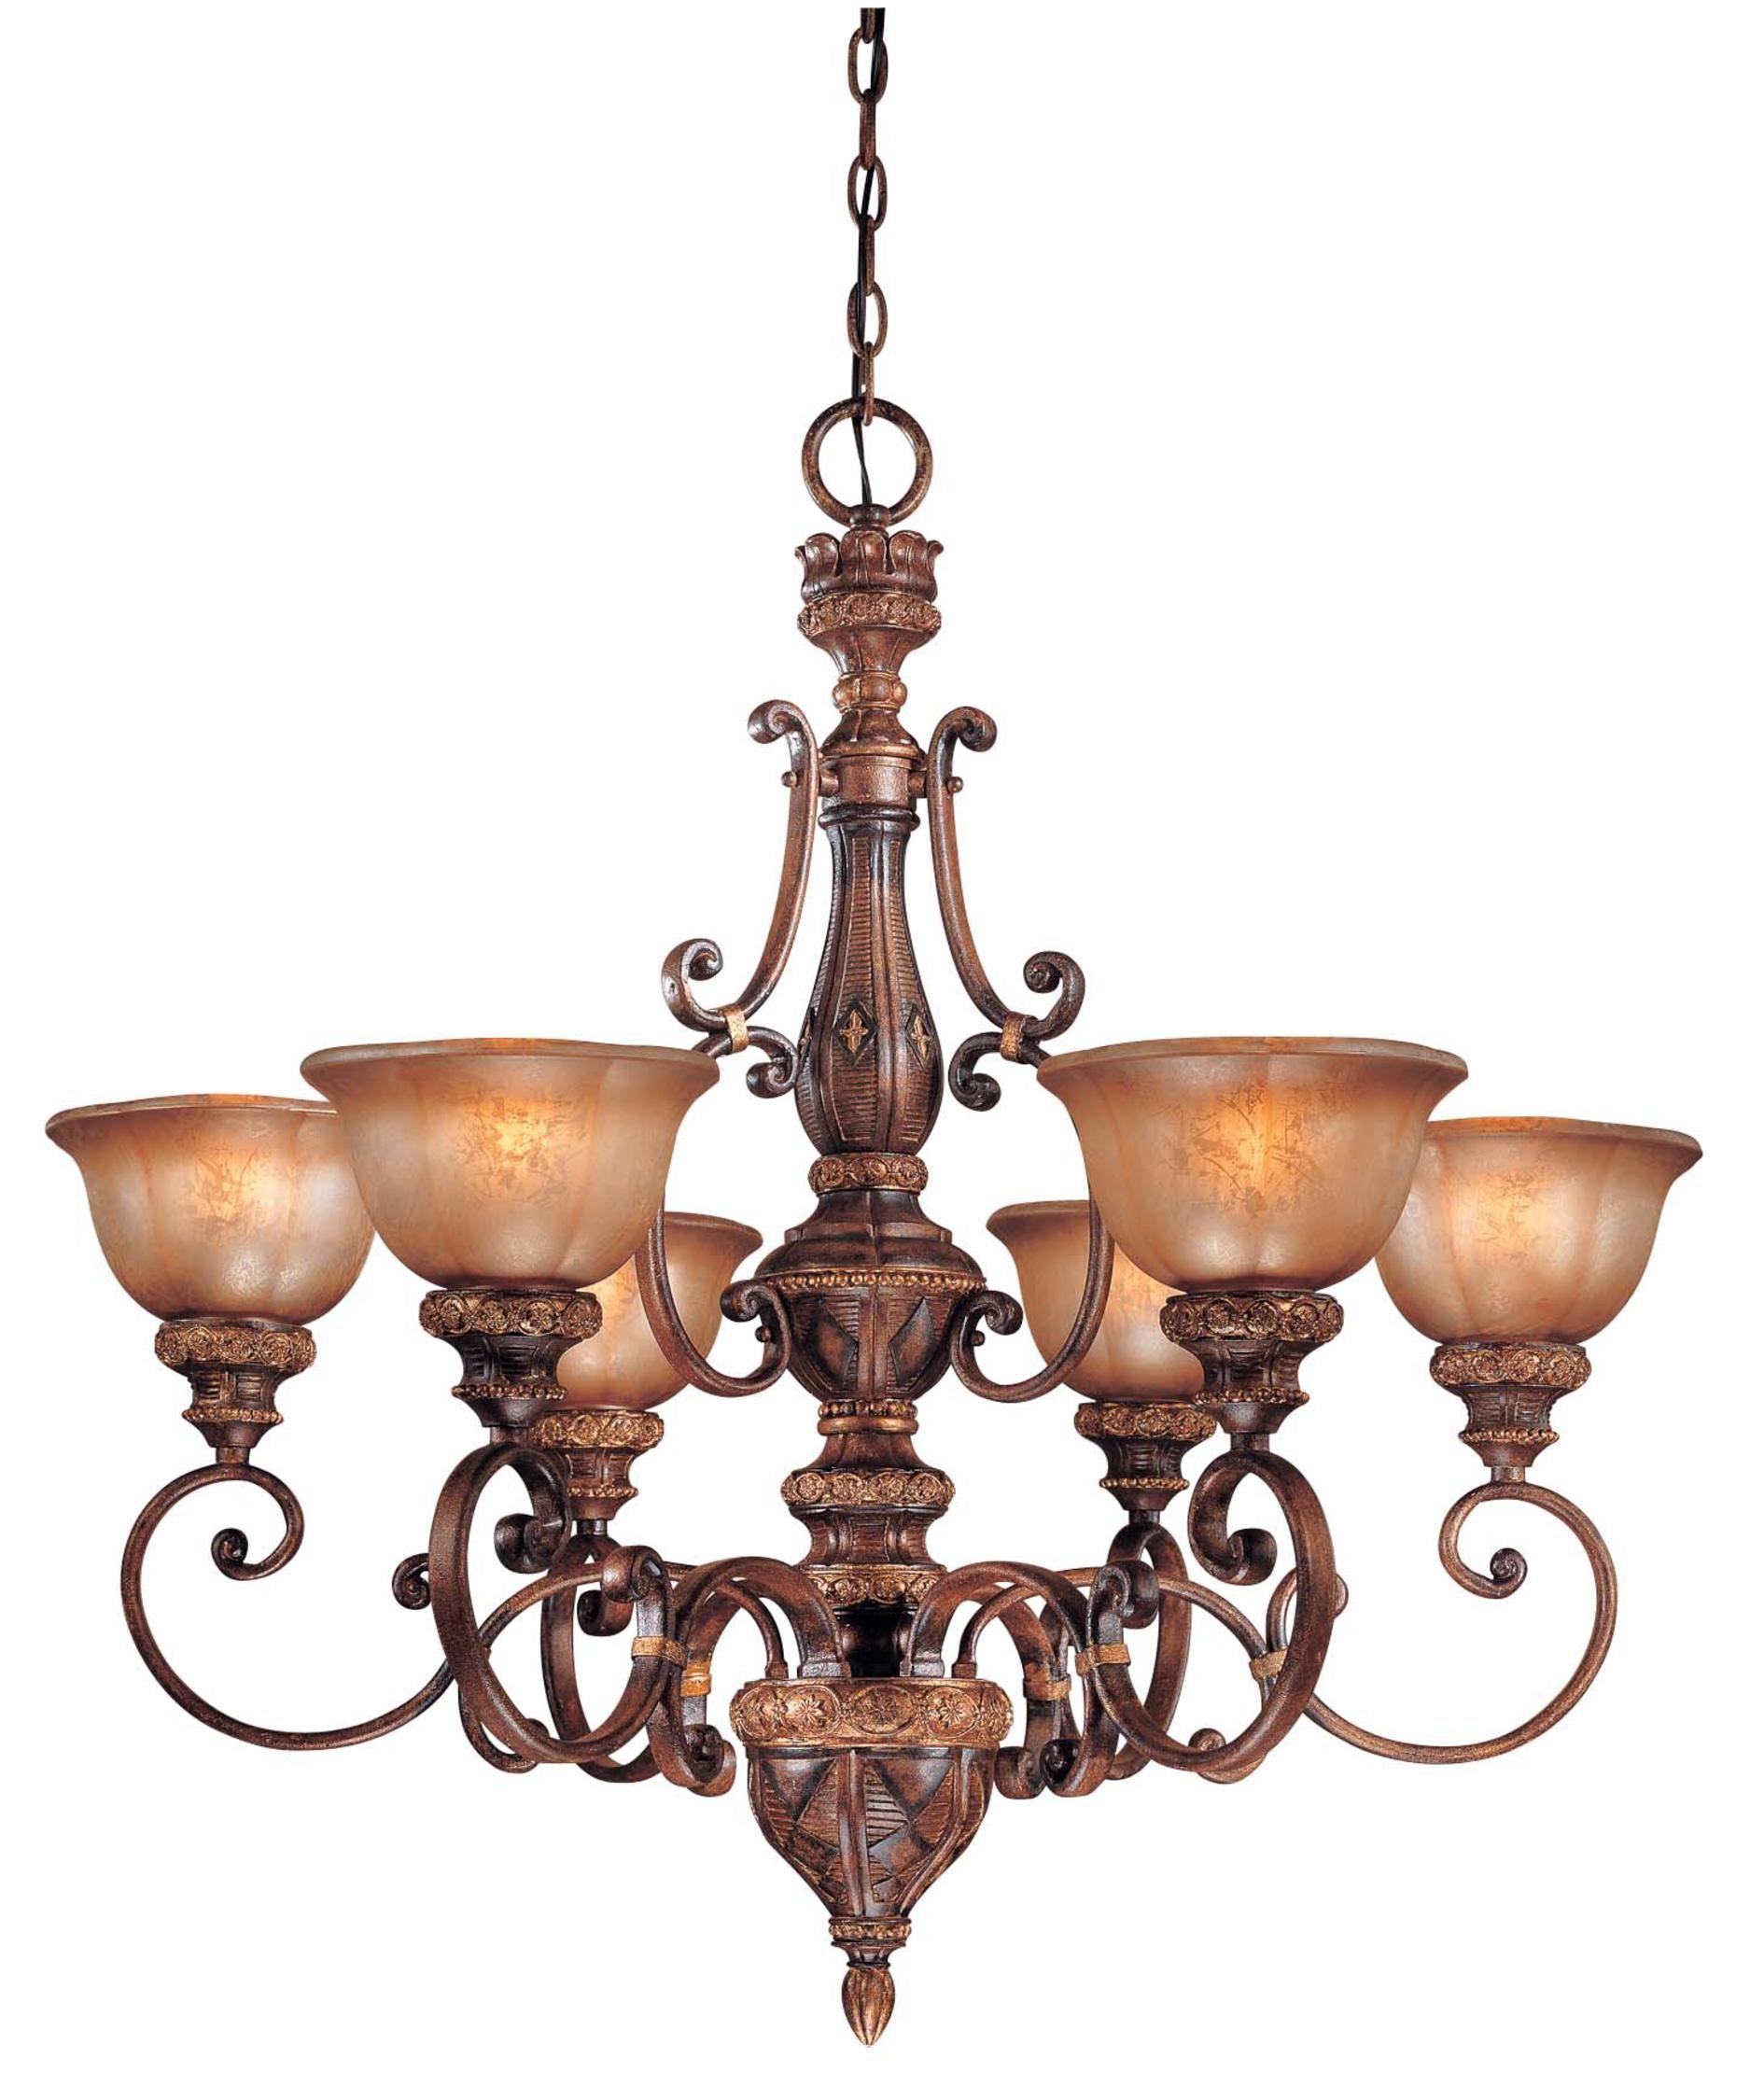 Minka lavery 1356 illuminati 34 inch chandelier capitol lighting 1 minka lavery 1356 illuminati 34 inch chandelier capitol lighting 1 800lighting arubaitofo Gallery